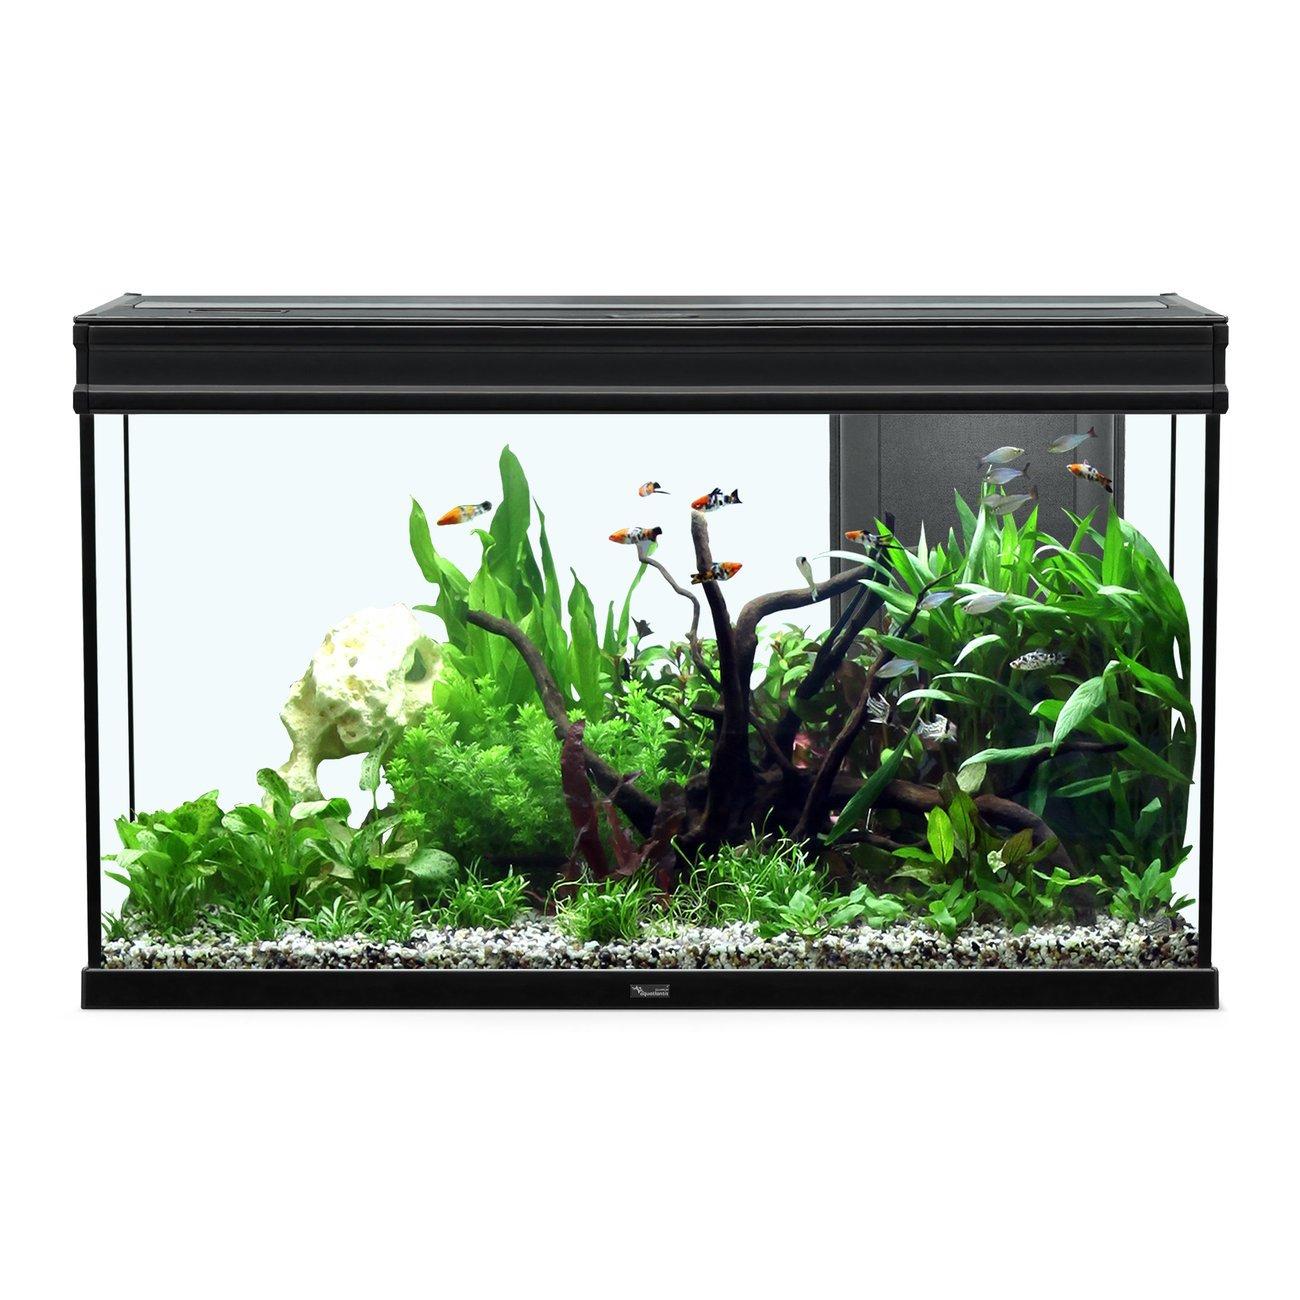 Aquatlantis Elegance Expert 100 Aquarium